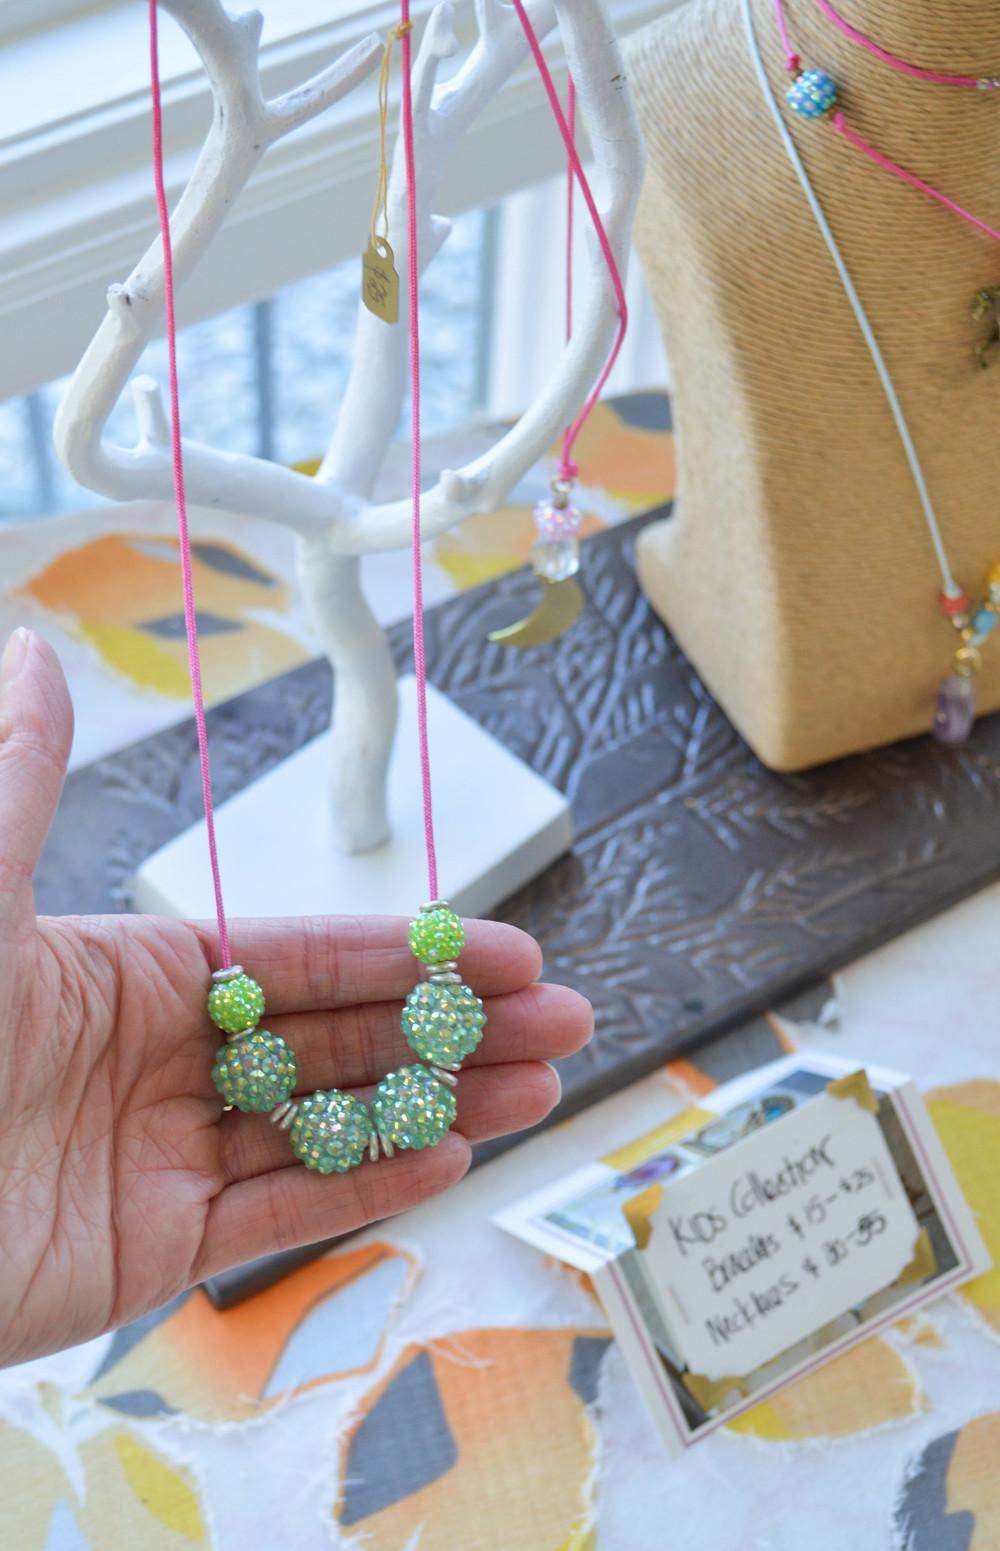 Laura-James-Jewelry-Kids-Collection-Charlotte-NC-LaurenSchwaiger-life-style-blog.jpg